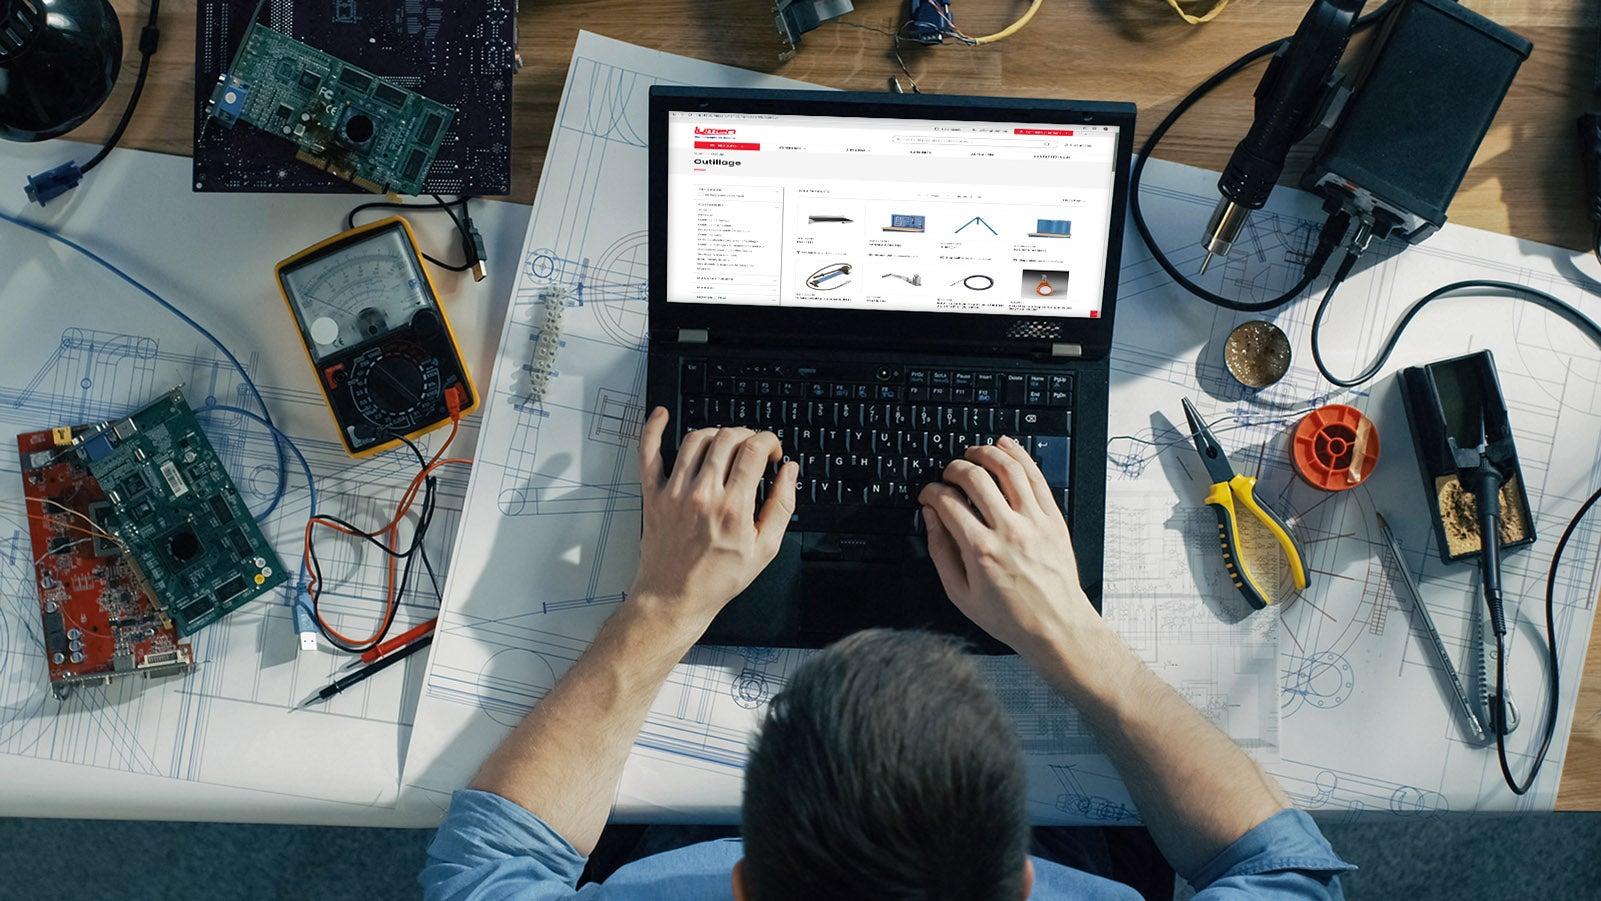 Eleknet, our e-commerce solution